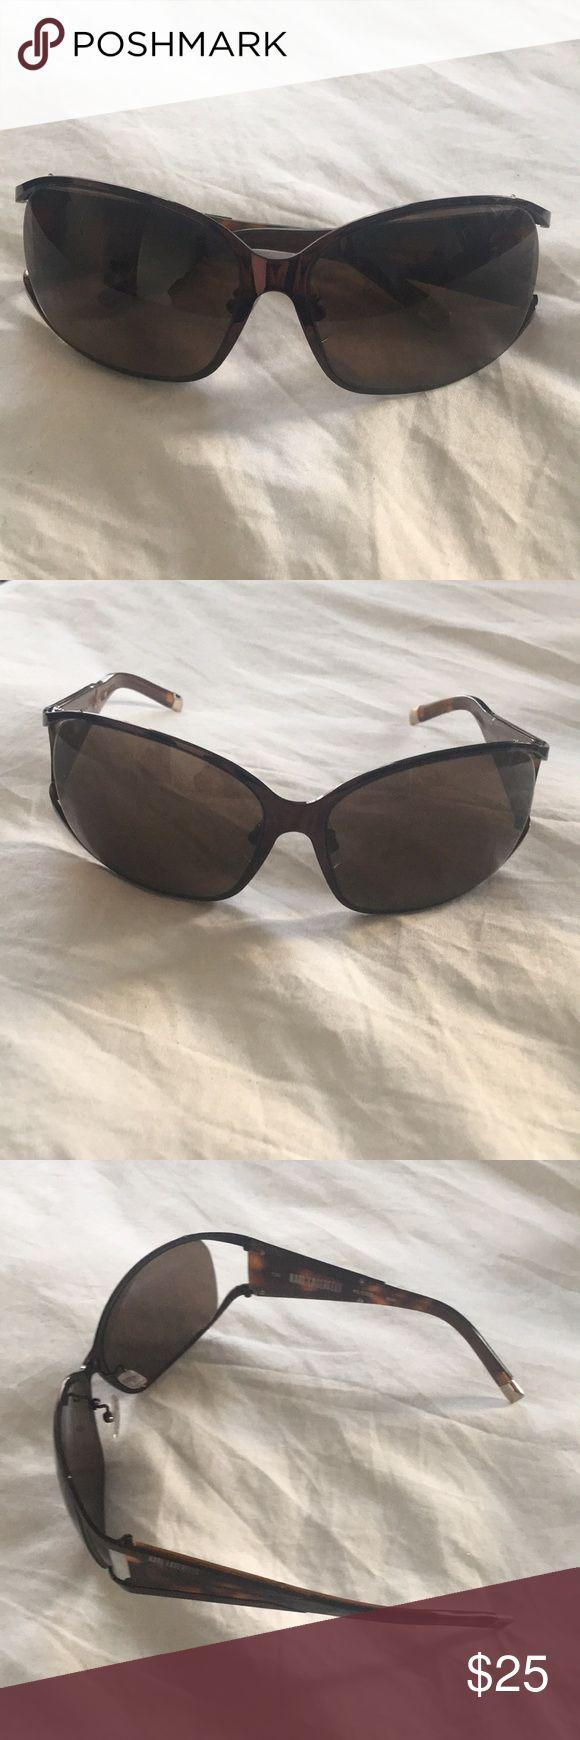 Karl Lagerfeld Brown Sunglasses Barely worn. No case. Details are below.   Model: KL 125/S Vertical: 46mm Frame Color: Brown Bridge Size: 15mm Frame Material: Metal Designer: Karl Lagerfeld Lens Color: Brown Lens Width:62mm  Temple Length: 120mm Karl Lagerfeld Accessories Sunglasses